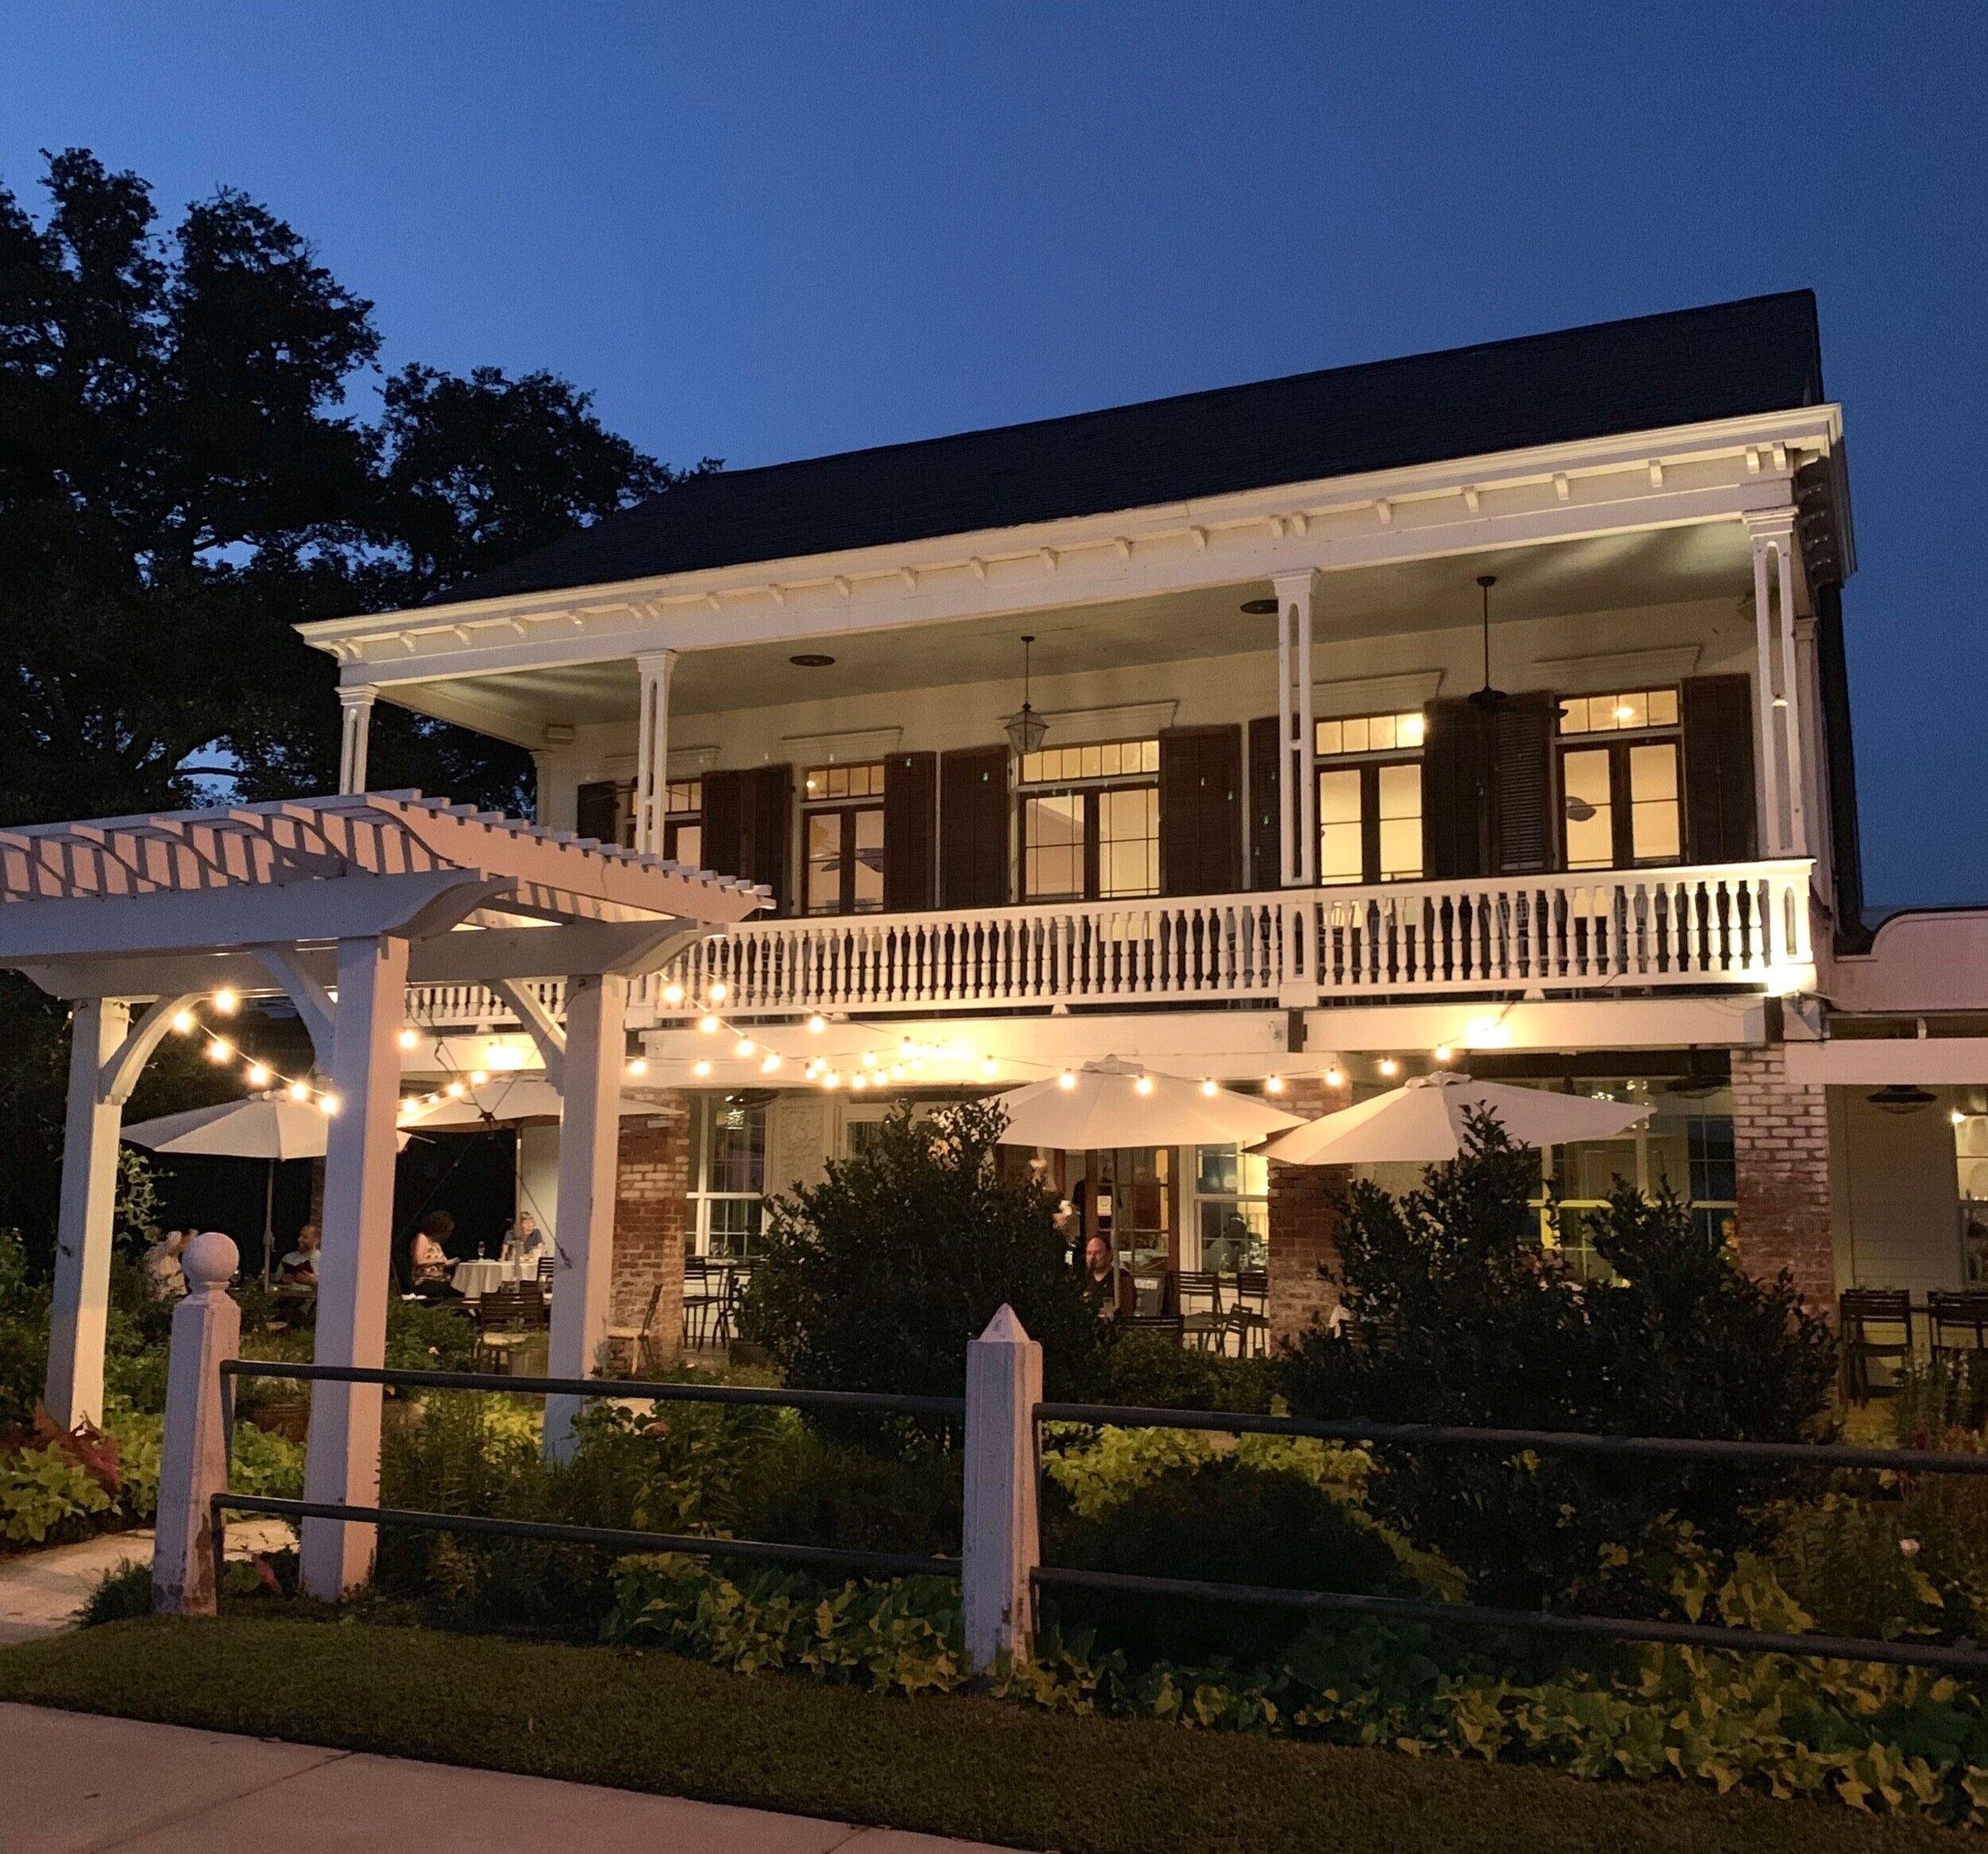 The Lakehouse Mandeville - a beautiful date night spot